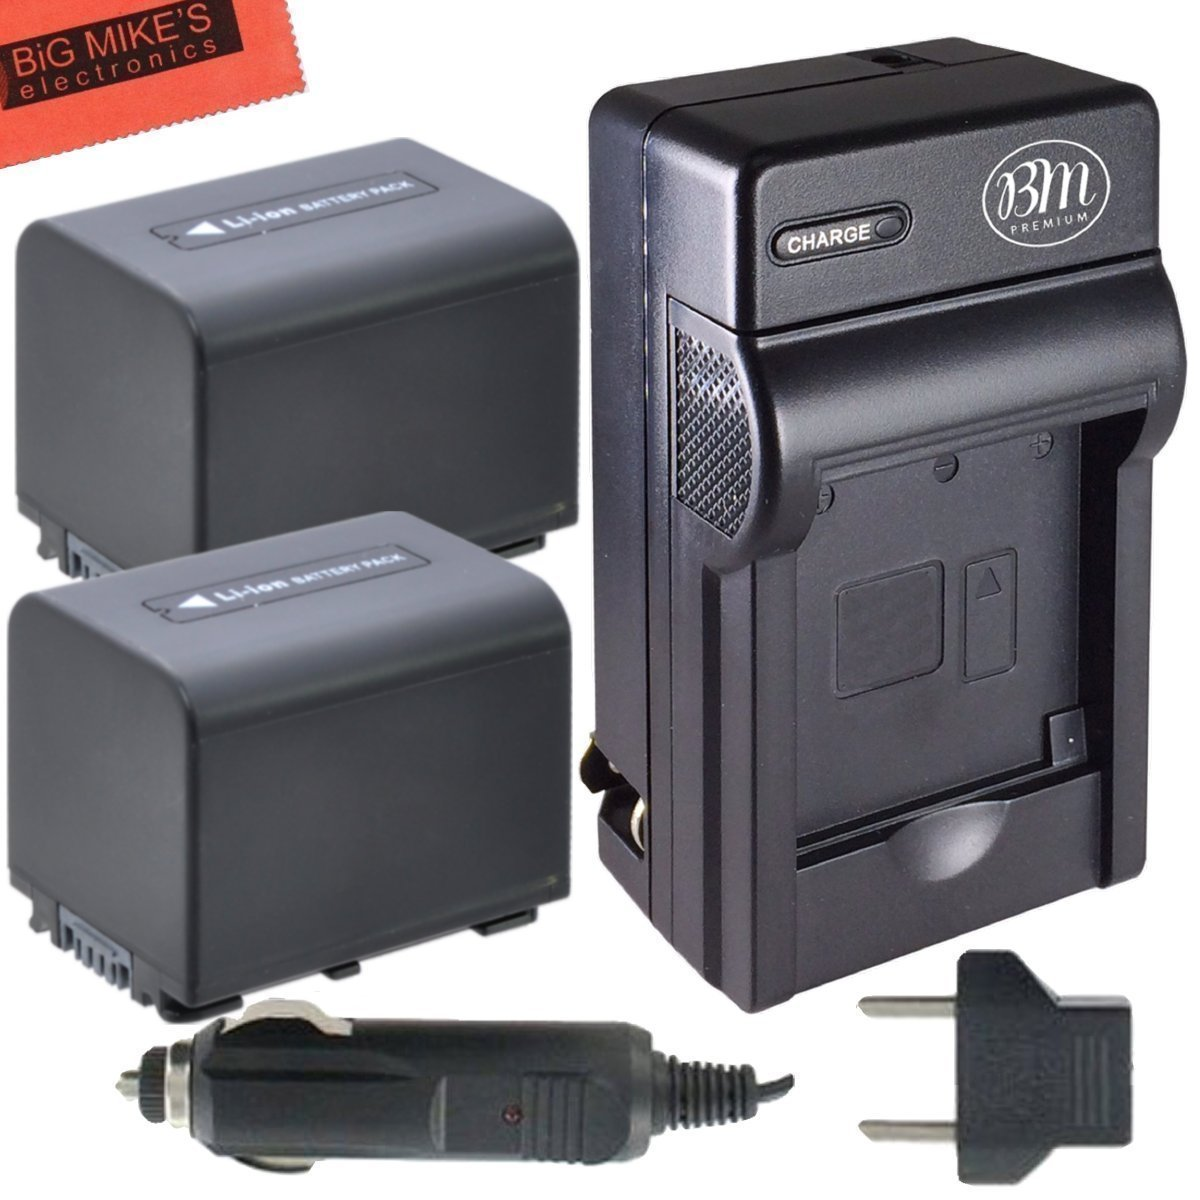 BM Premium Pack of 2 NP-FV70 Batteries & Charger Kit for Sony FDR-AX53 HDR-CX455/B HDR-CX675/B HDR-CX330 HDR-CX900 HDR-PJ340 HDR-PJ540 HDR-PJ670/B HDR-PJ810 FDR-AX33/B FDR-AX100 Handycam Camcorder